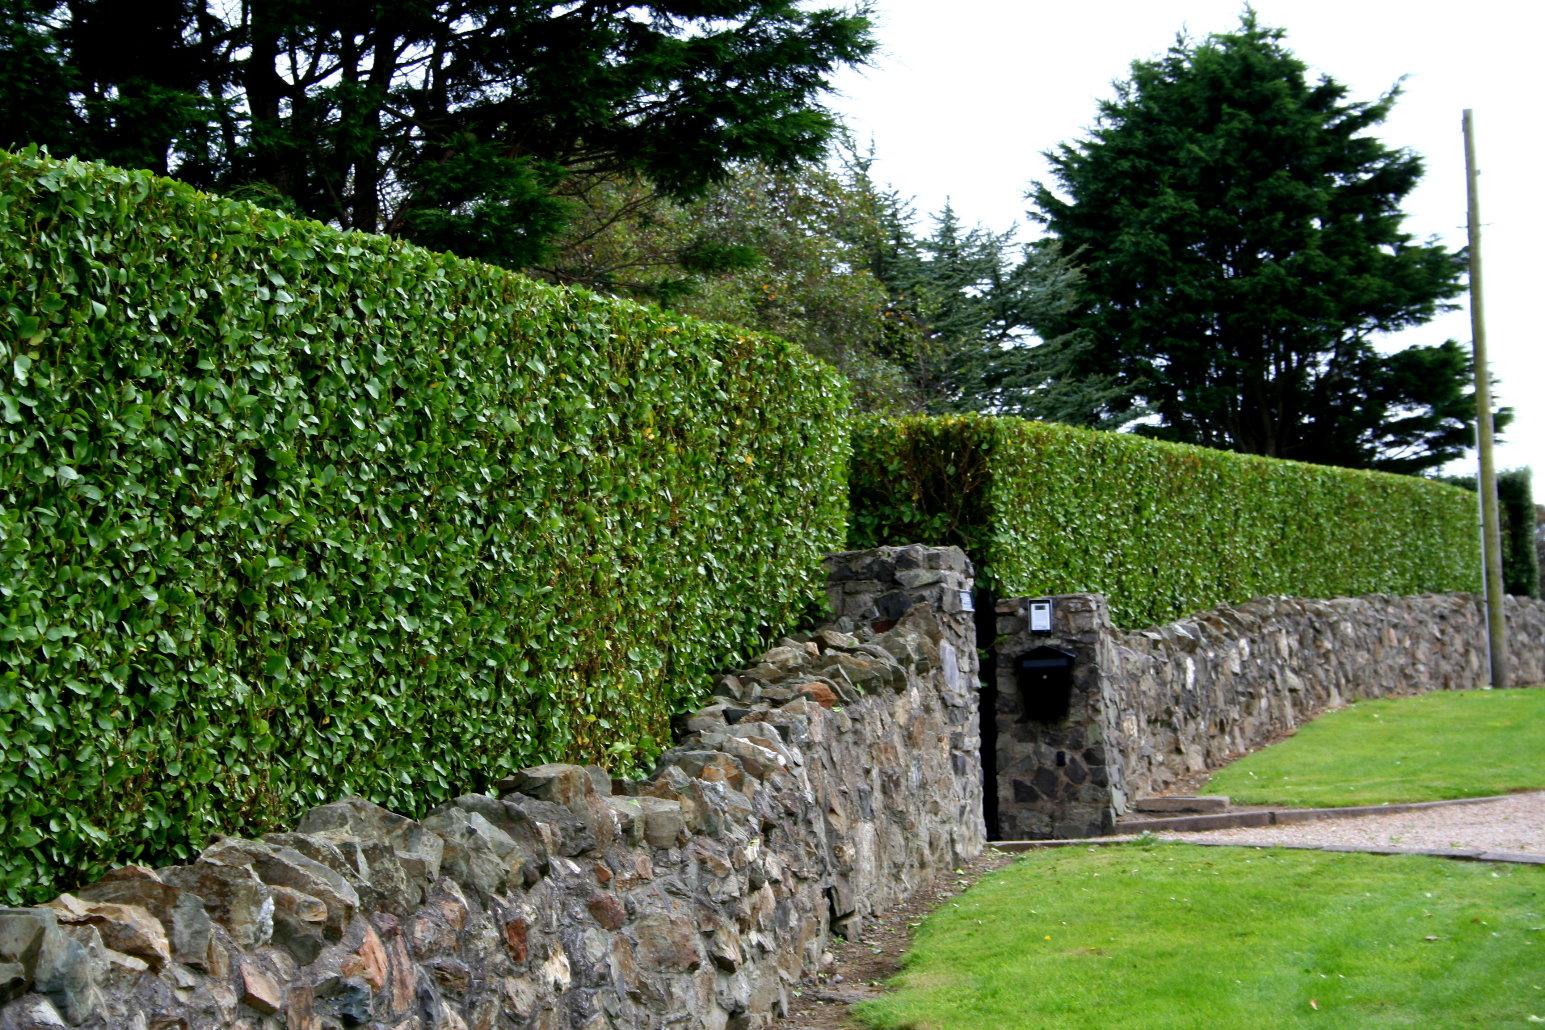 hedge cutting services dublin l hedge trimming dublin l hedges. Black Bedroom Furniture Sets. Home Design Ideas